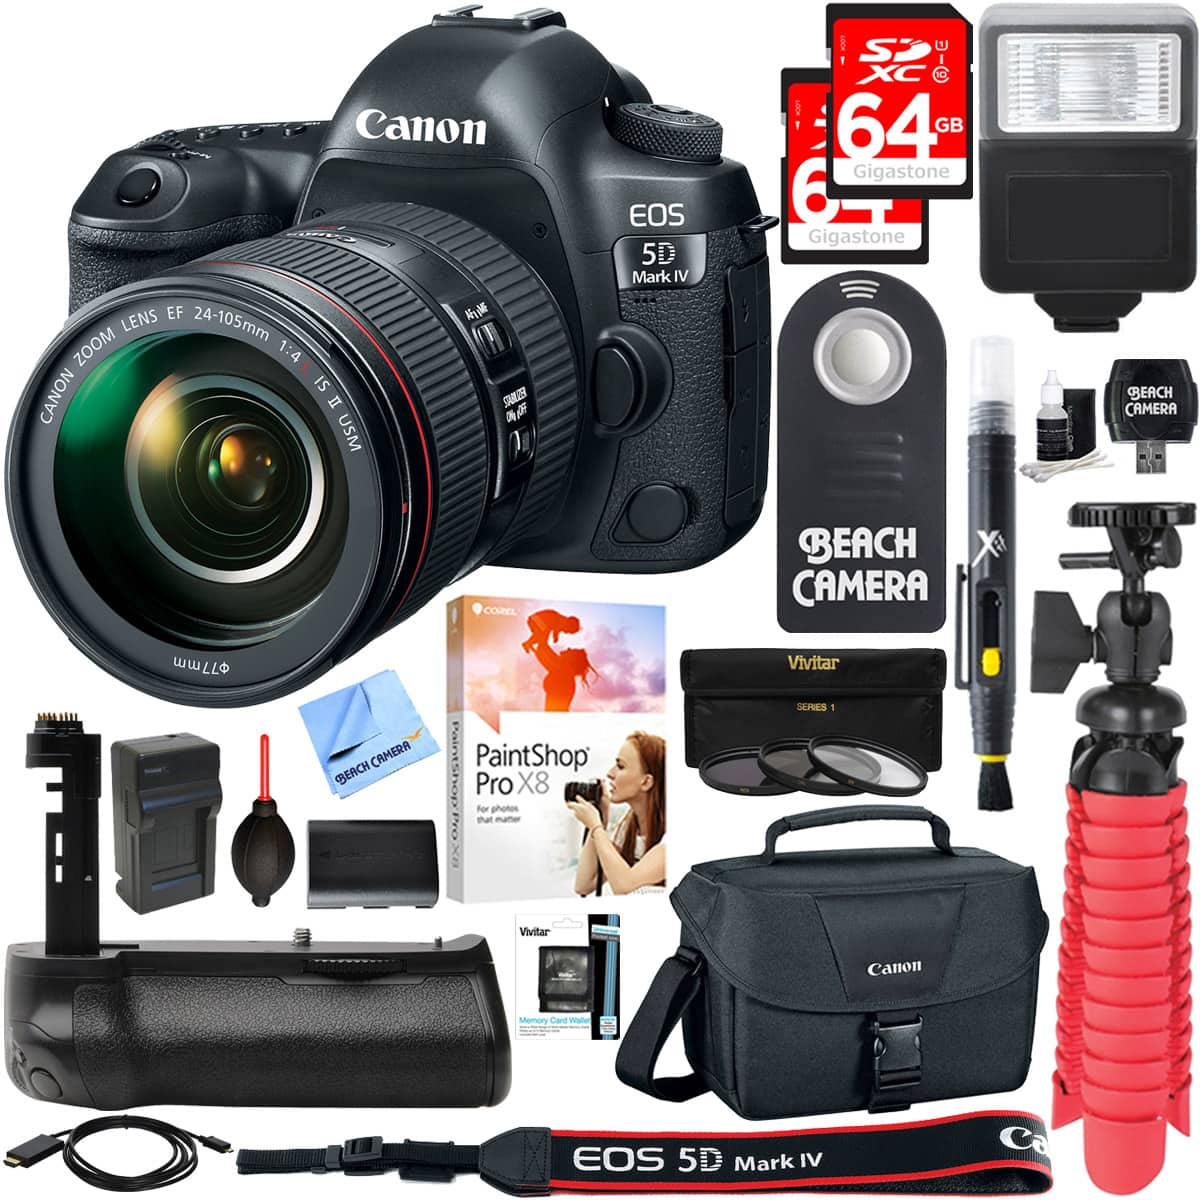 Price Mistake?? Canon EOS 5D Mark IV DSL Camera $1,044.00 on Walmart